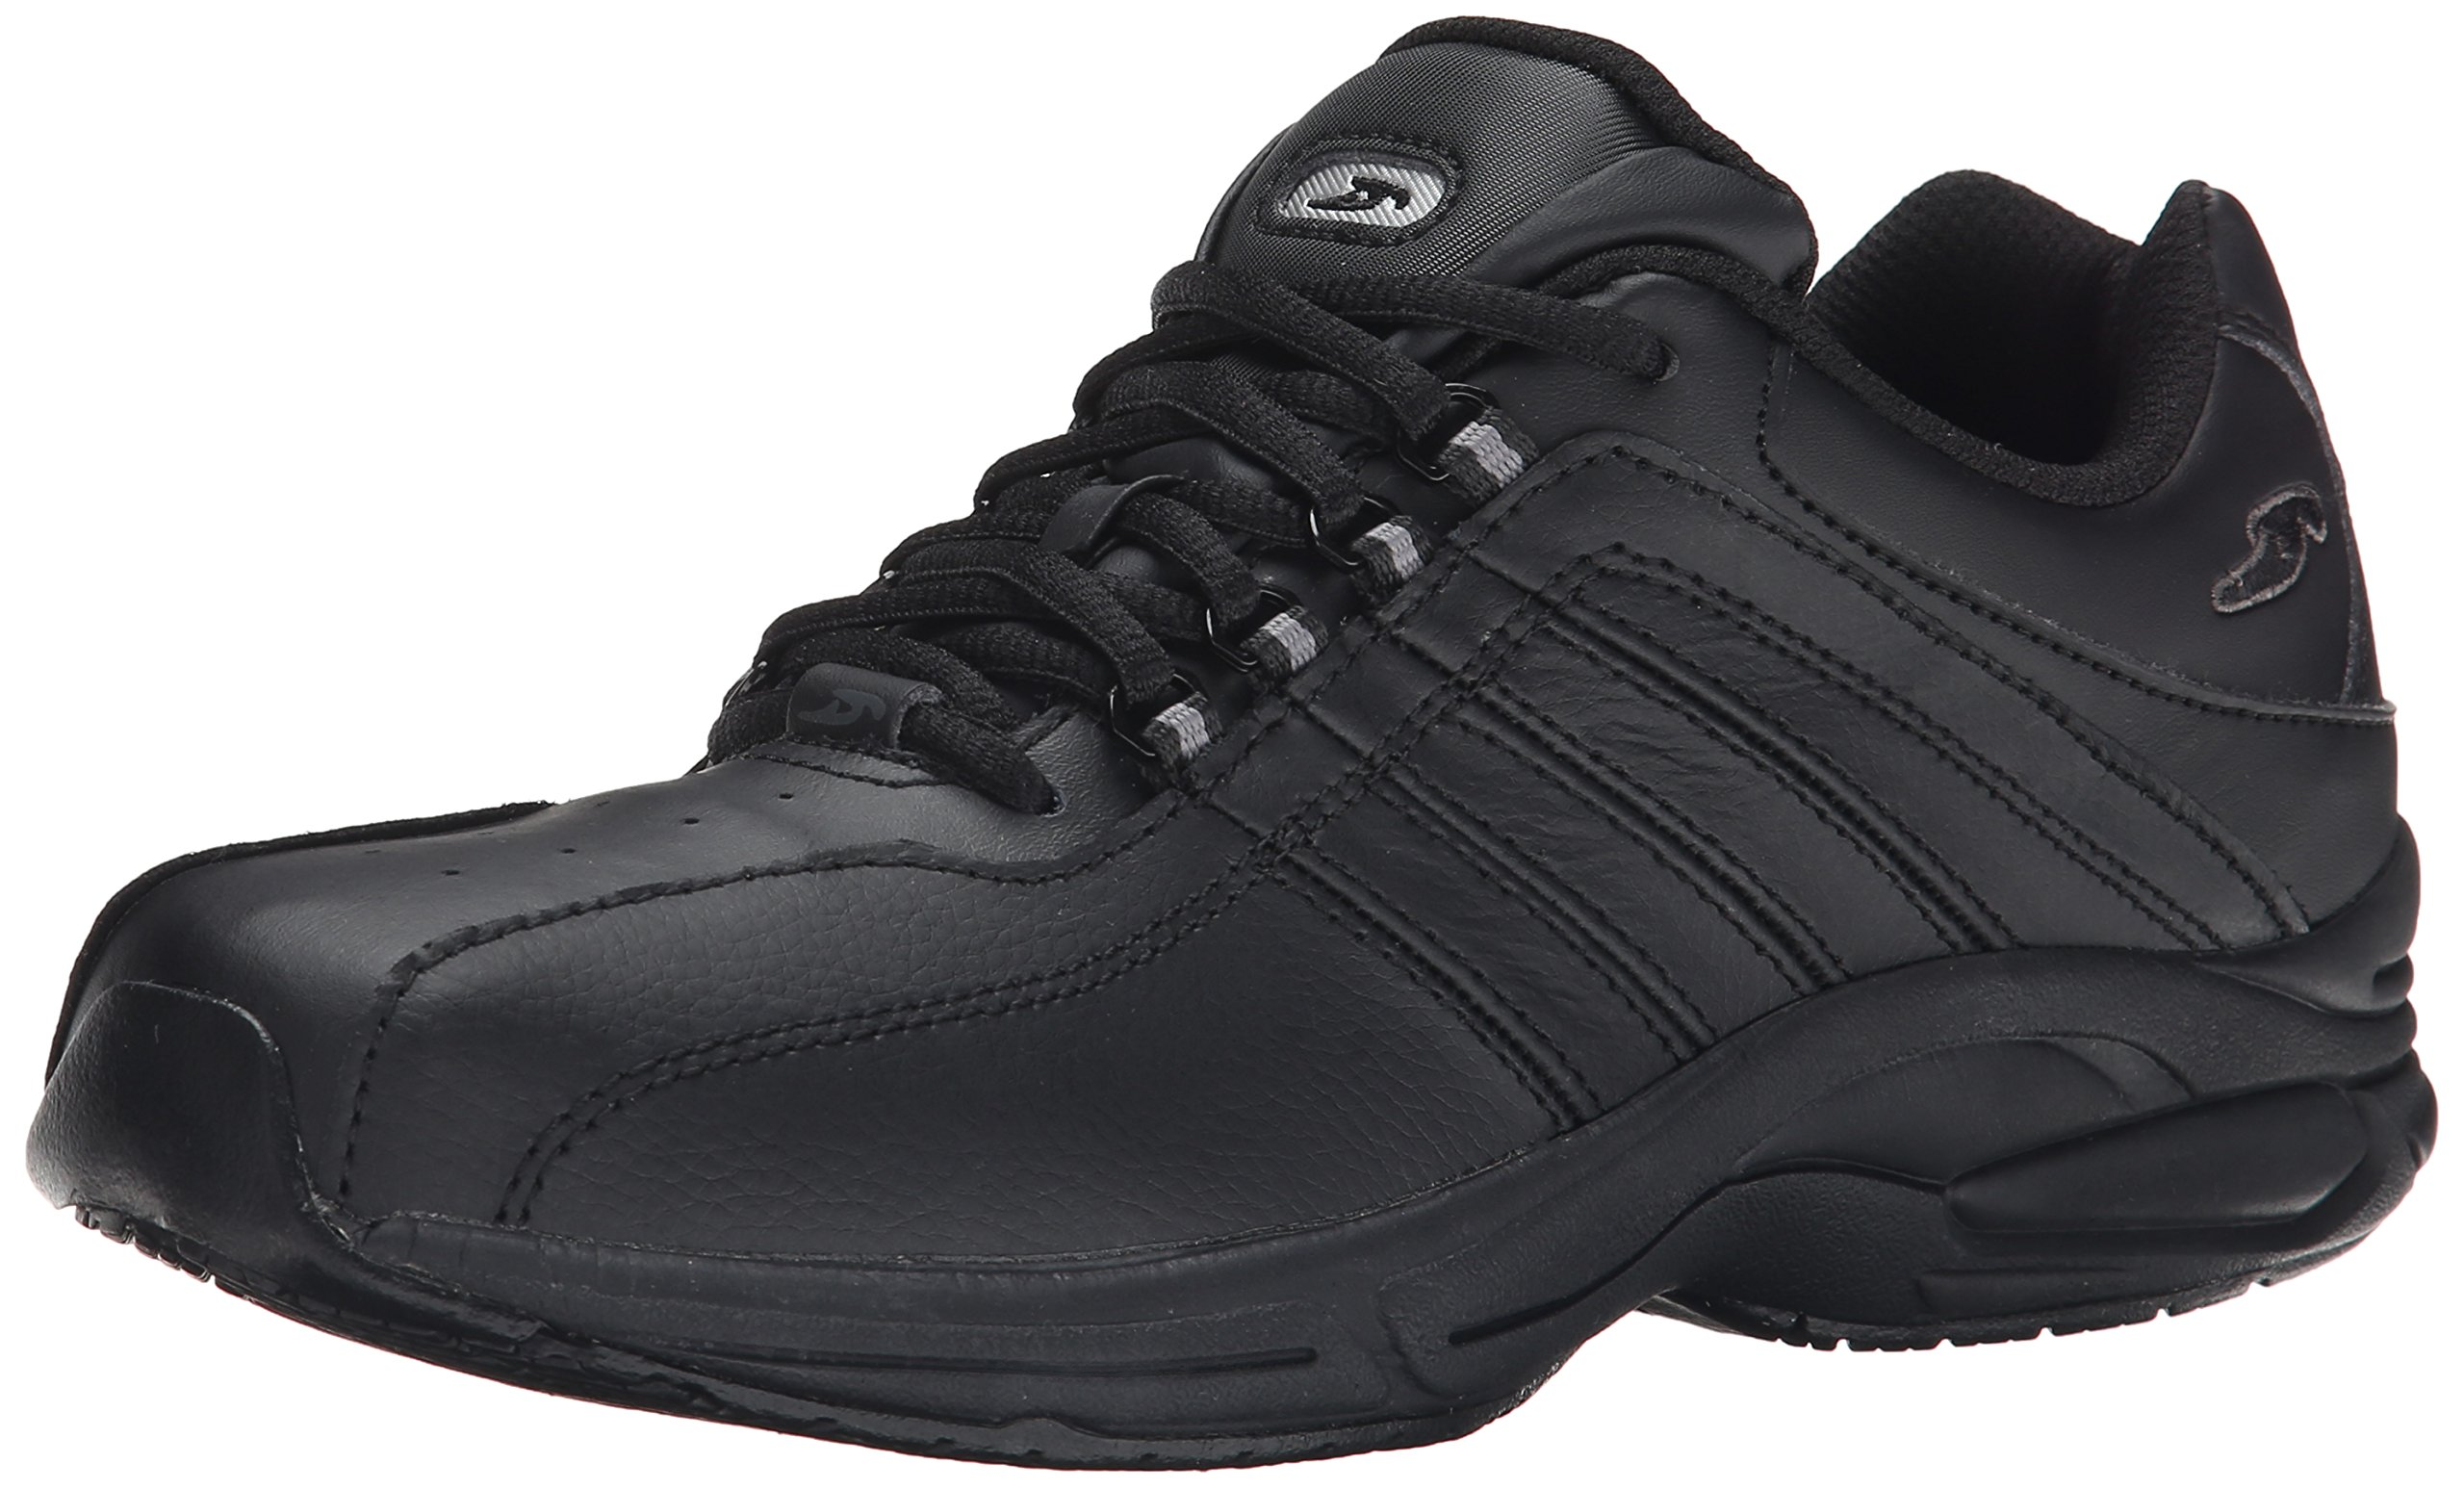 Dr. Scholl's Women's Kimberly Slip Resistant Work Shoe,Black,9 M US